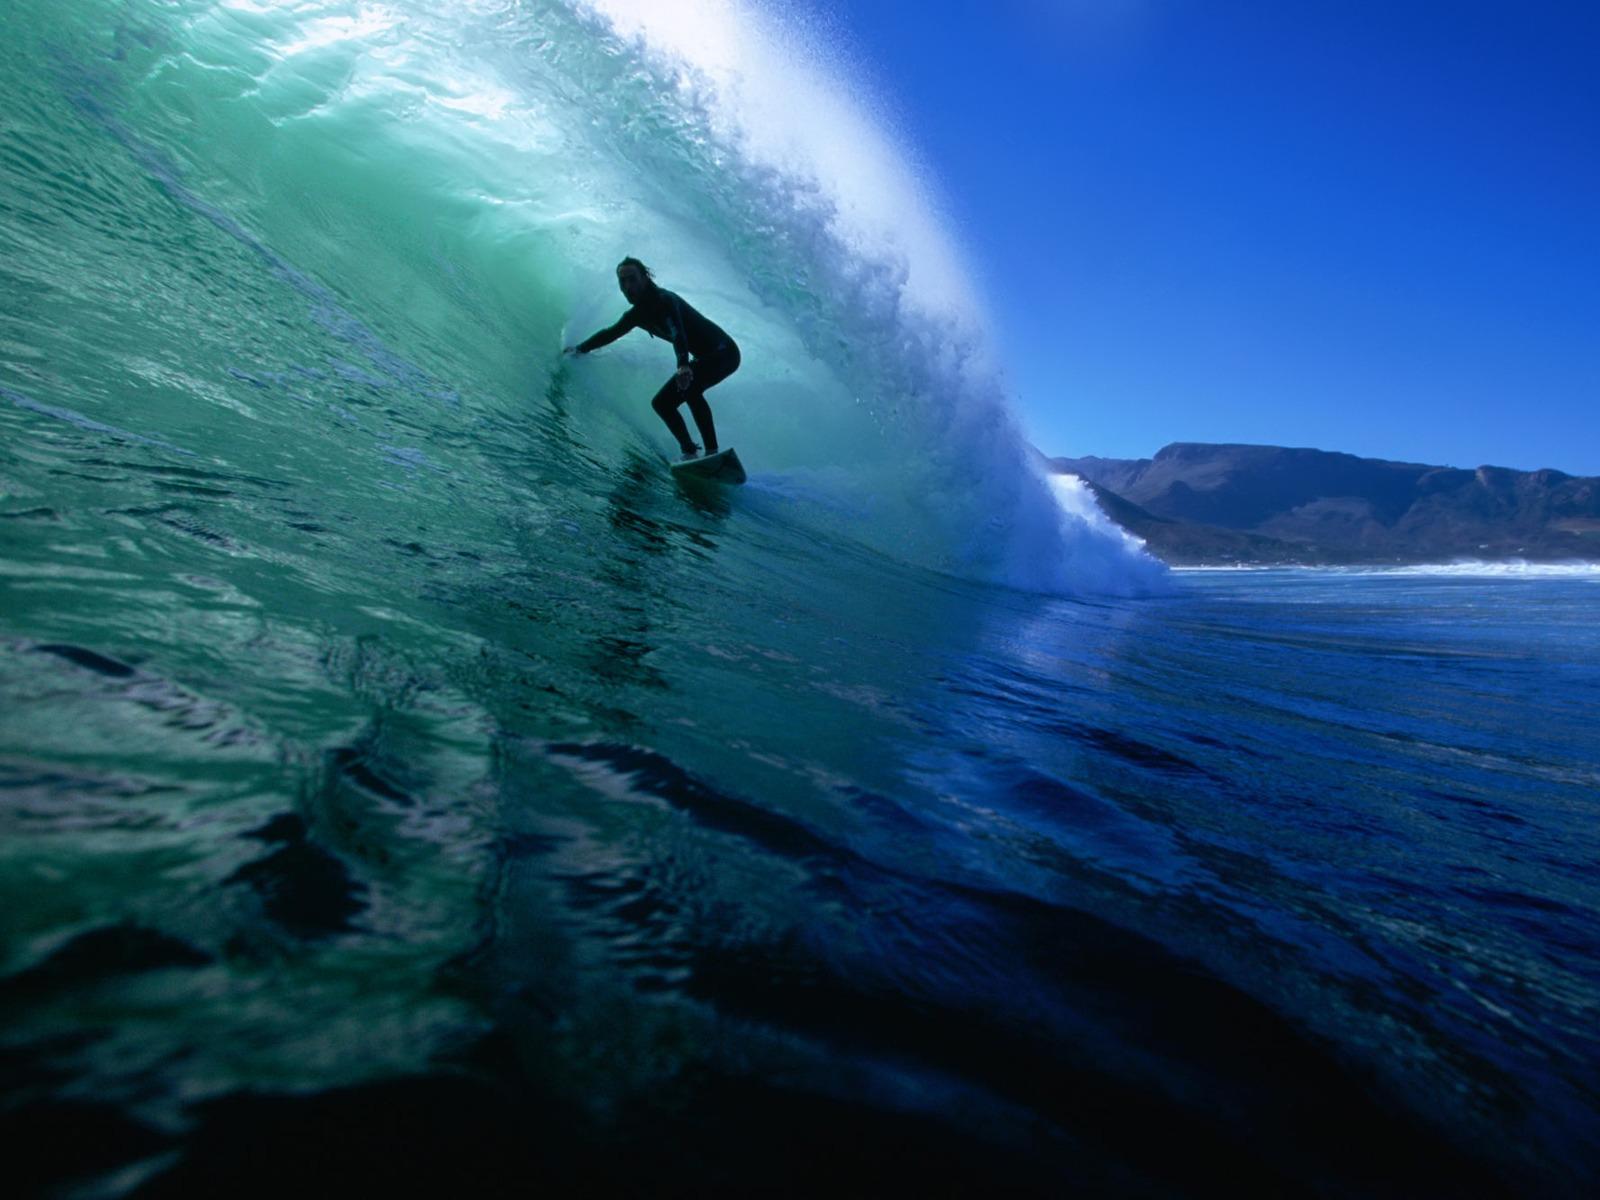 http://2.bp.blogspot.com/-n9-t_n09I3Q/Tw7Q6xSeiCI/AAAAAAAABWo/5GwJgZgtVtg/s1600/Surfing+Wallpaper+5.jpg